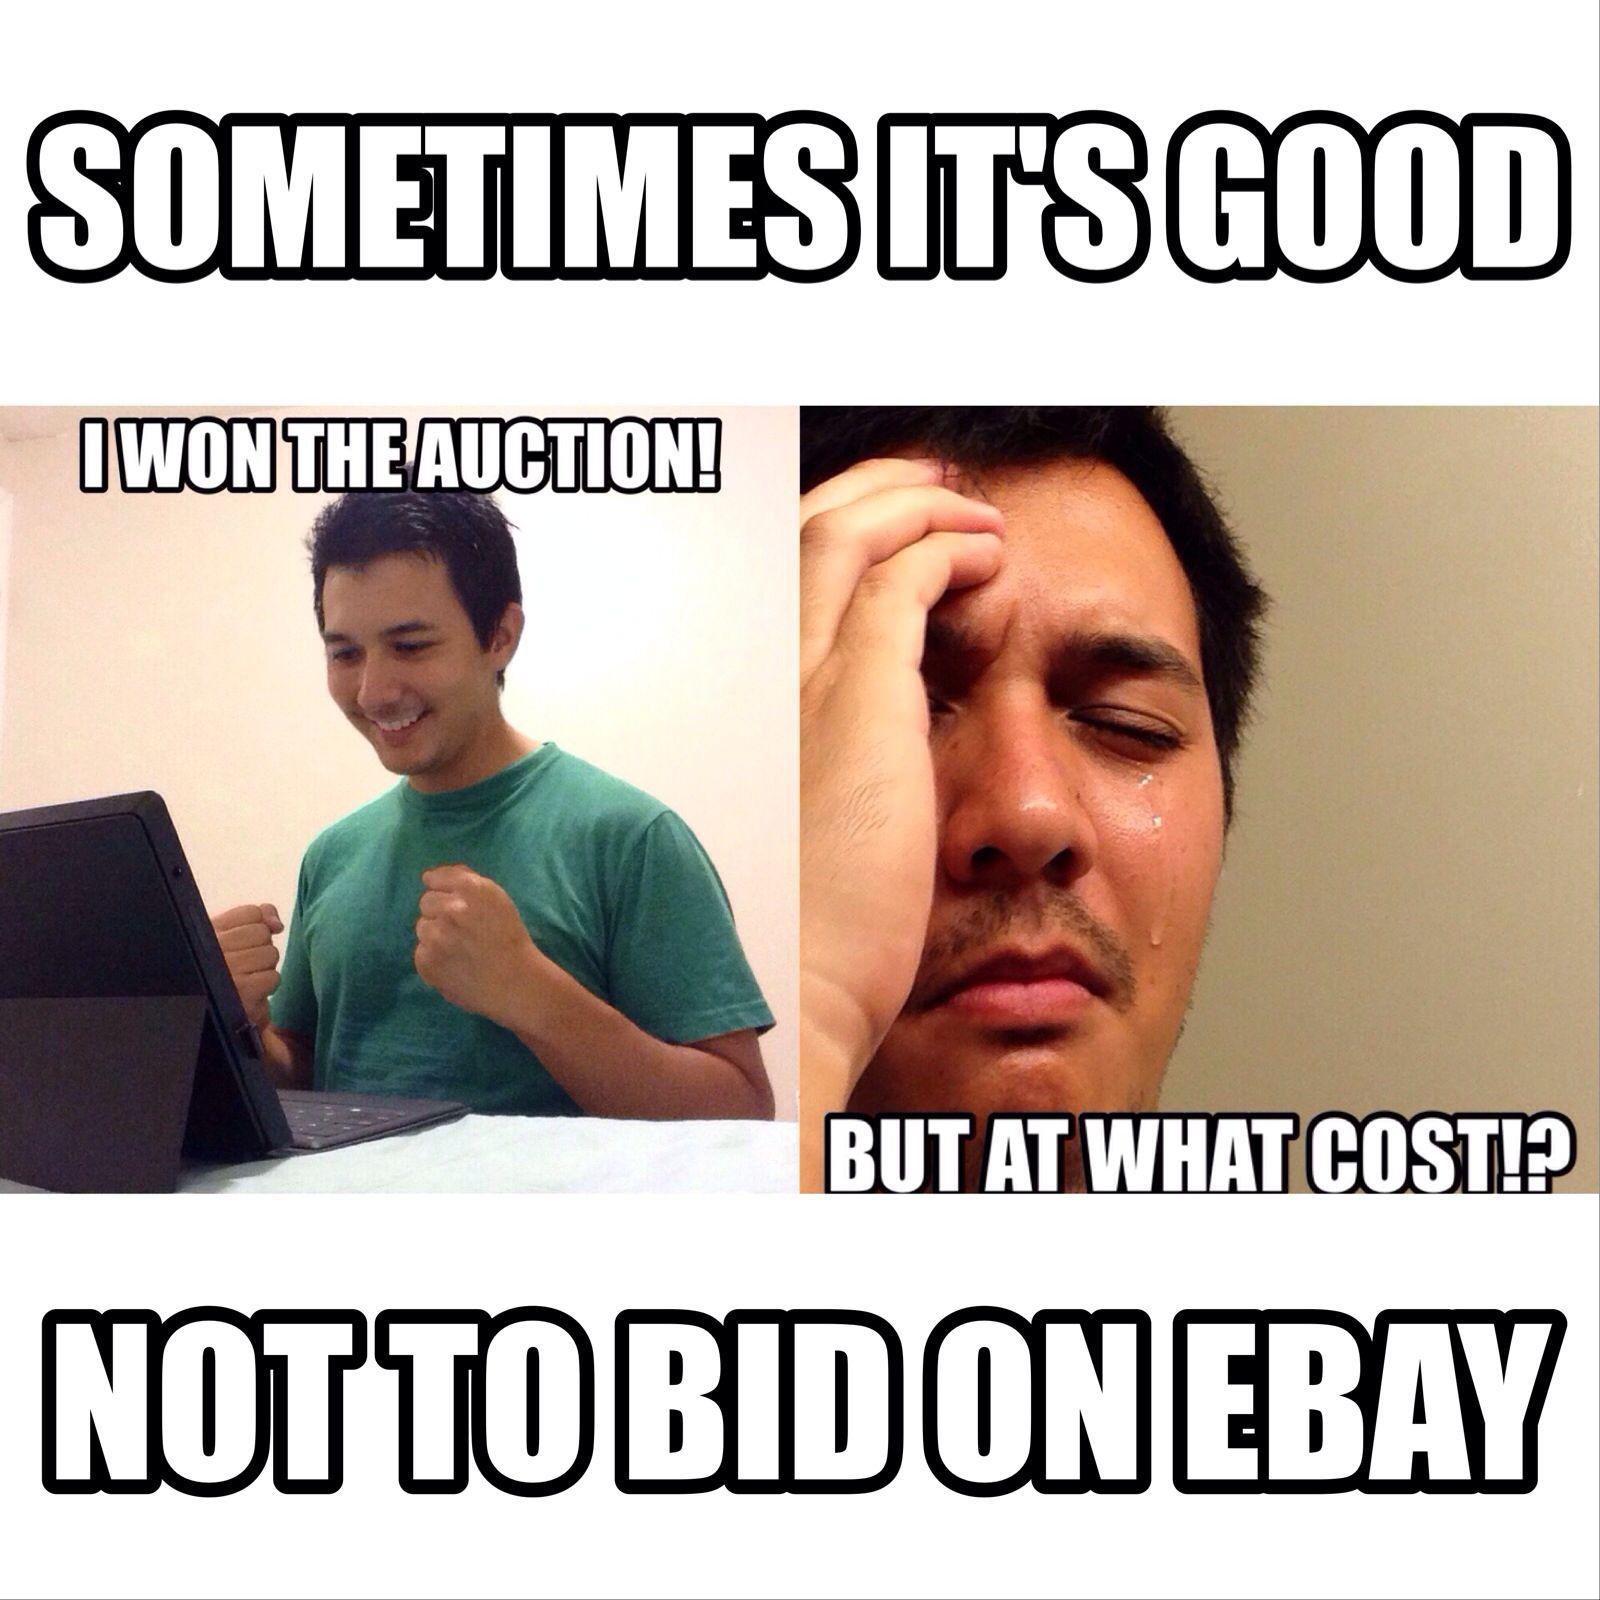 Pin On Ebay Amazon Funny And Make Money Stuff